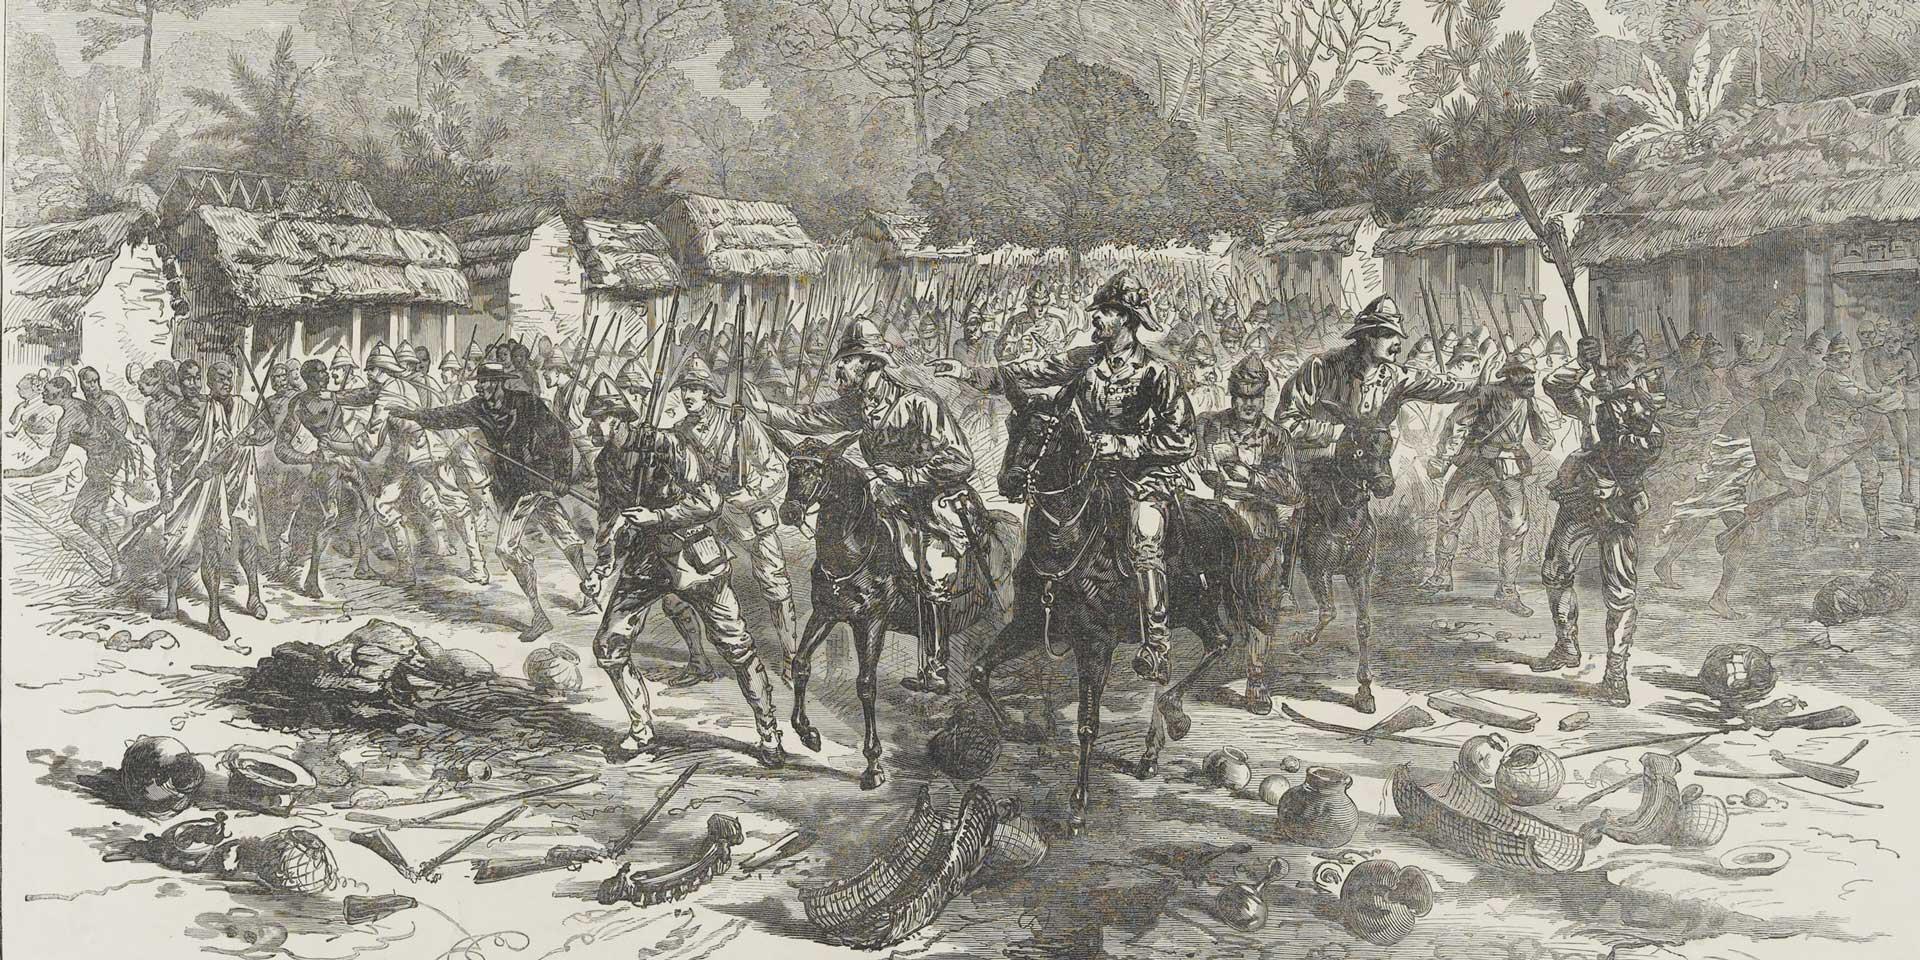 Major-General Sir Garnet Wolseley entering Kumasi, 1874